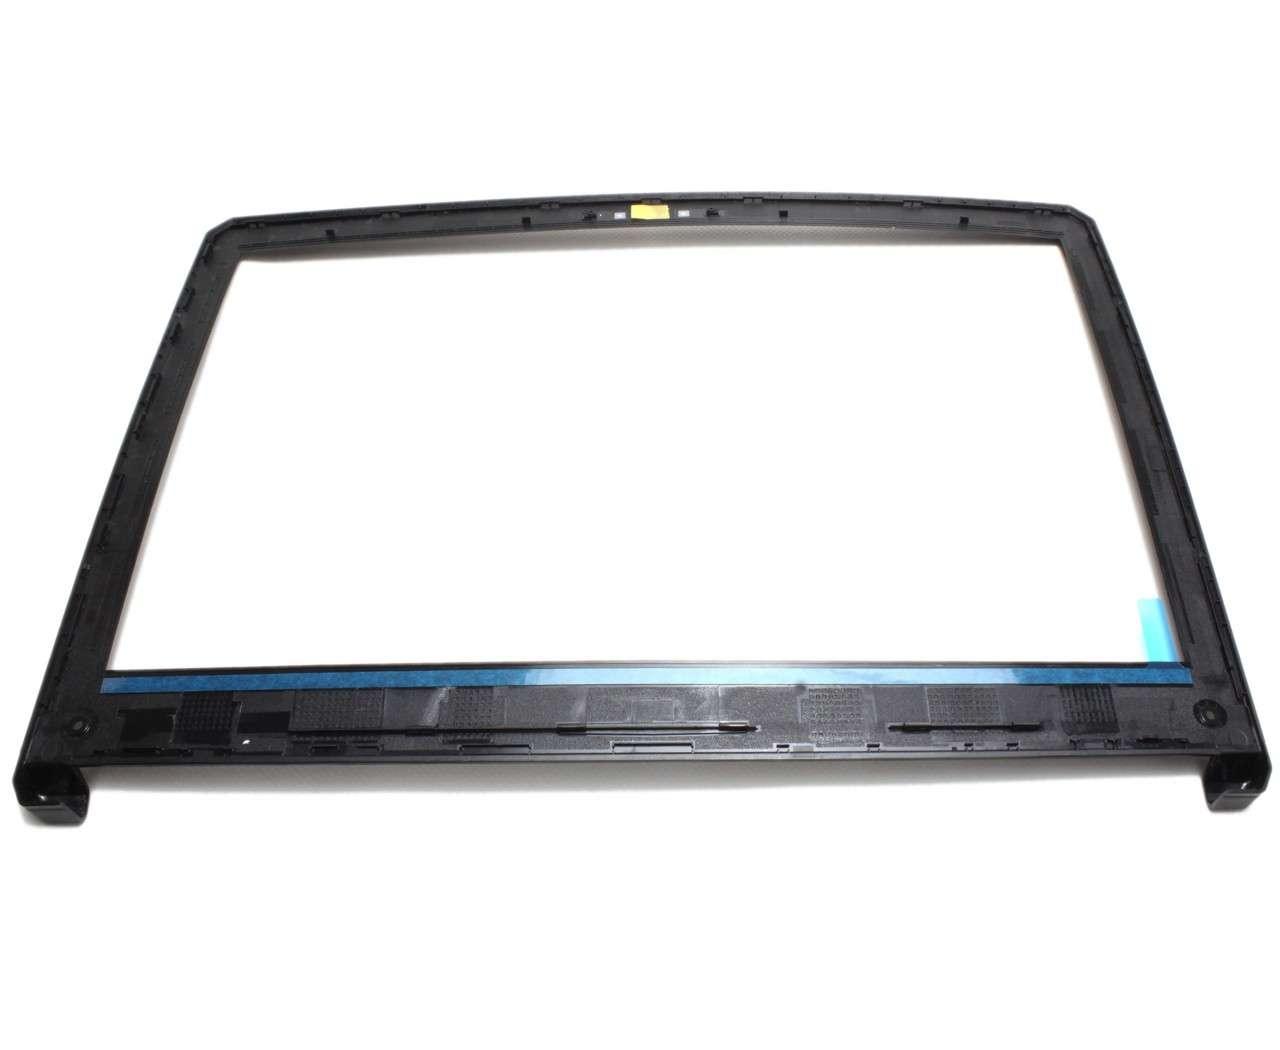 Rama Display Asus FX504 Bezel Front Cover Neagra imagine powerlaptop.ro 2021